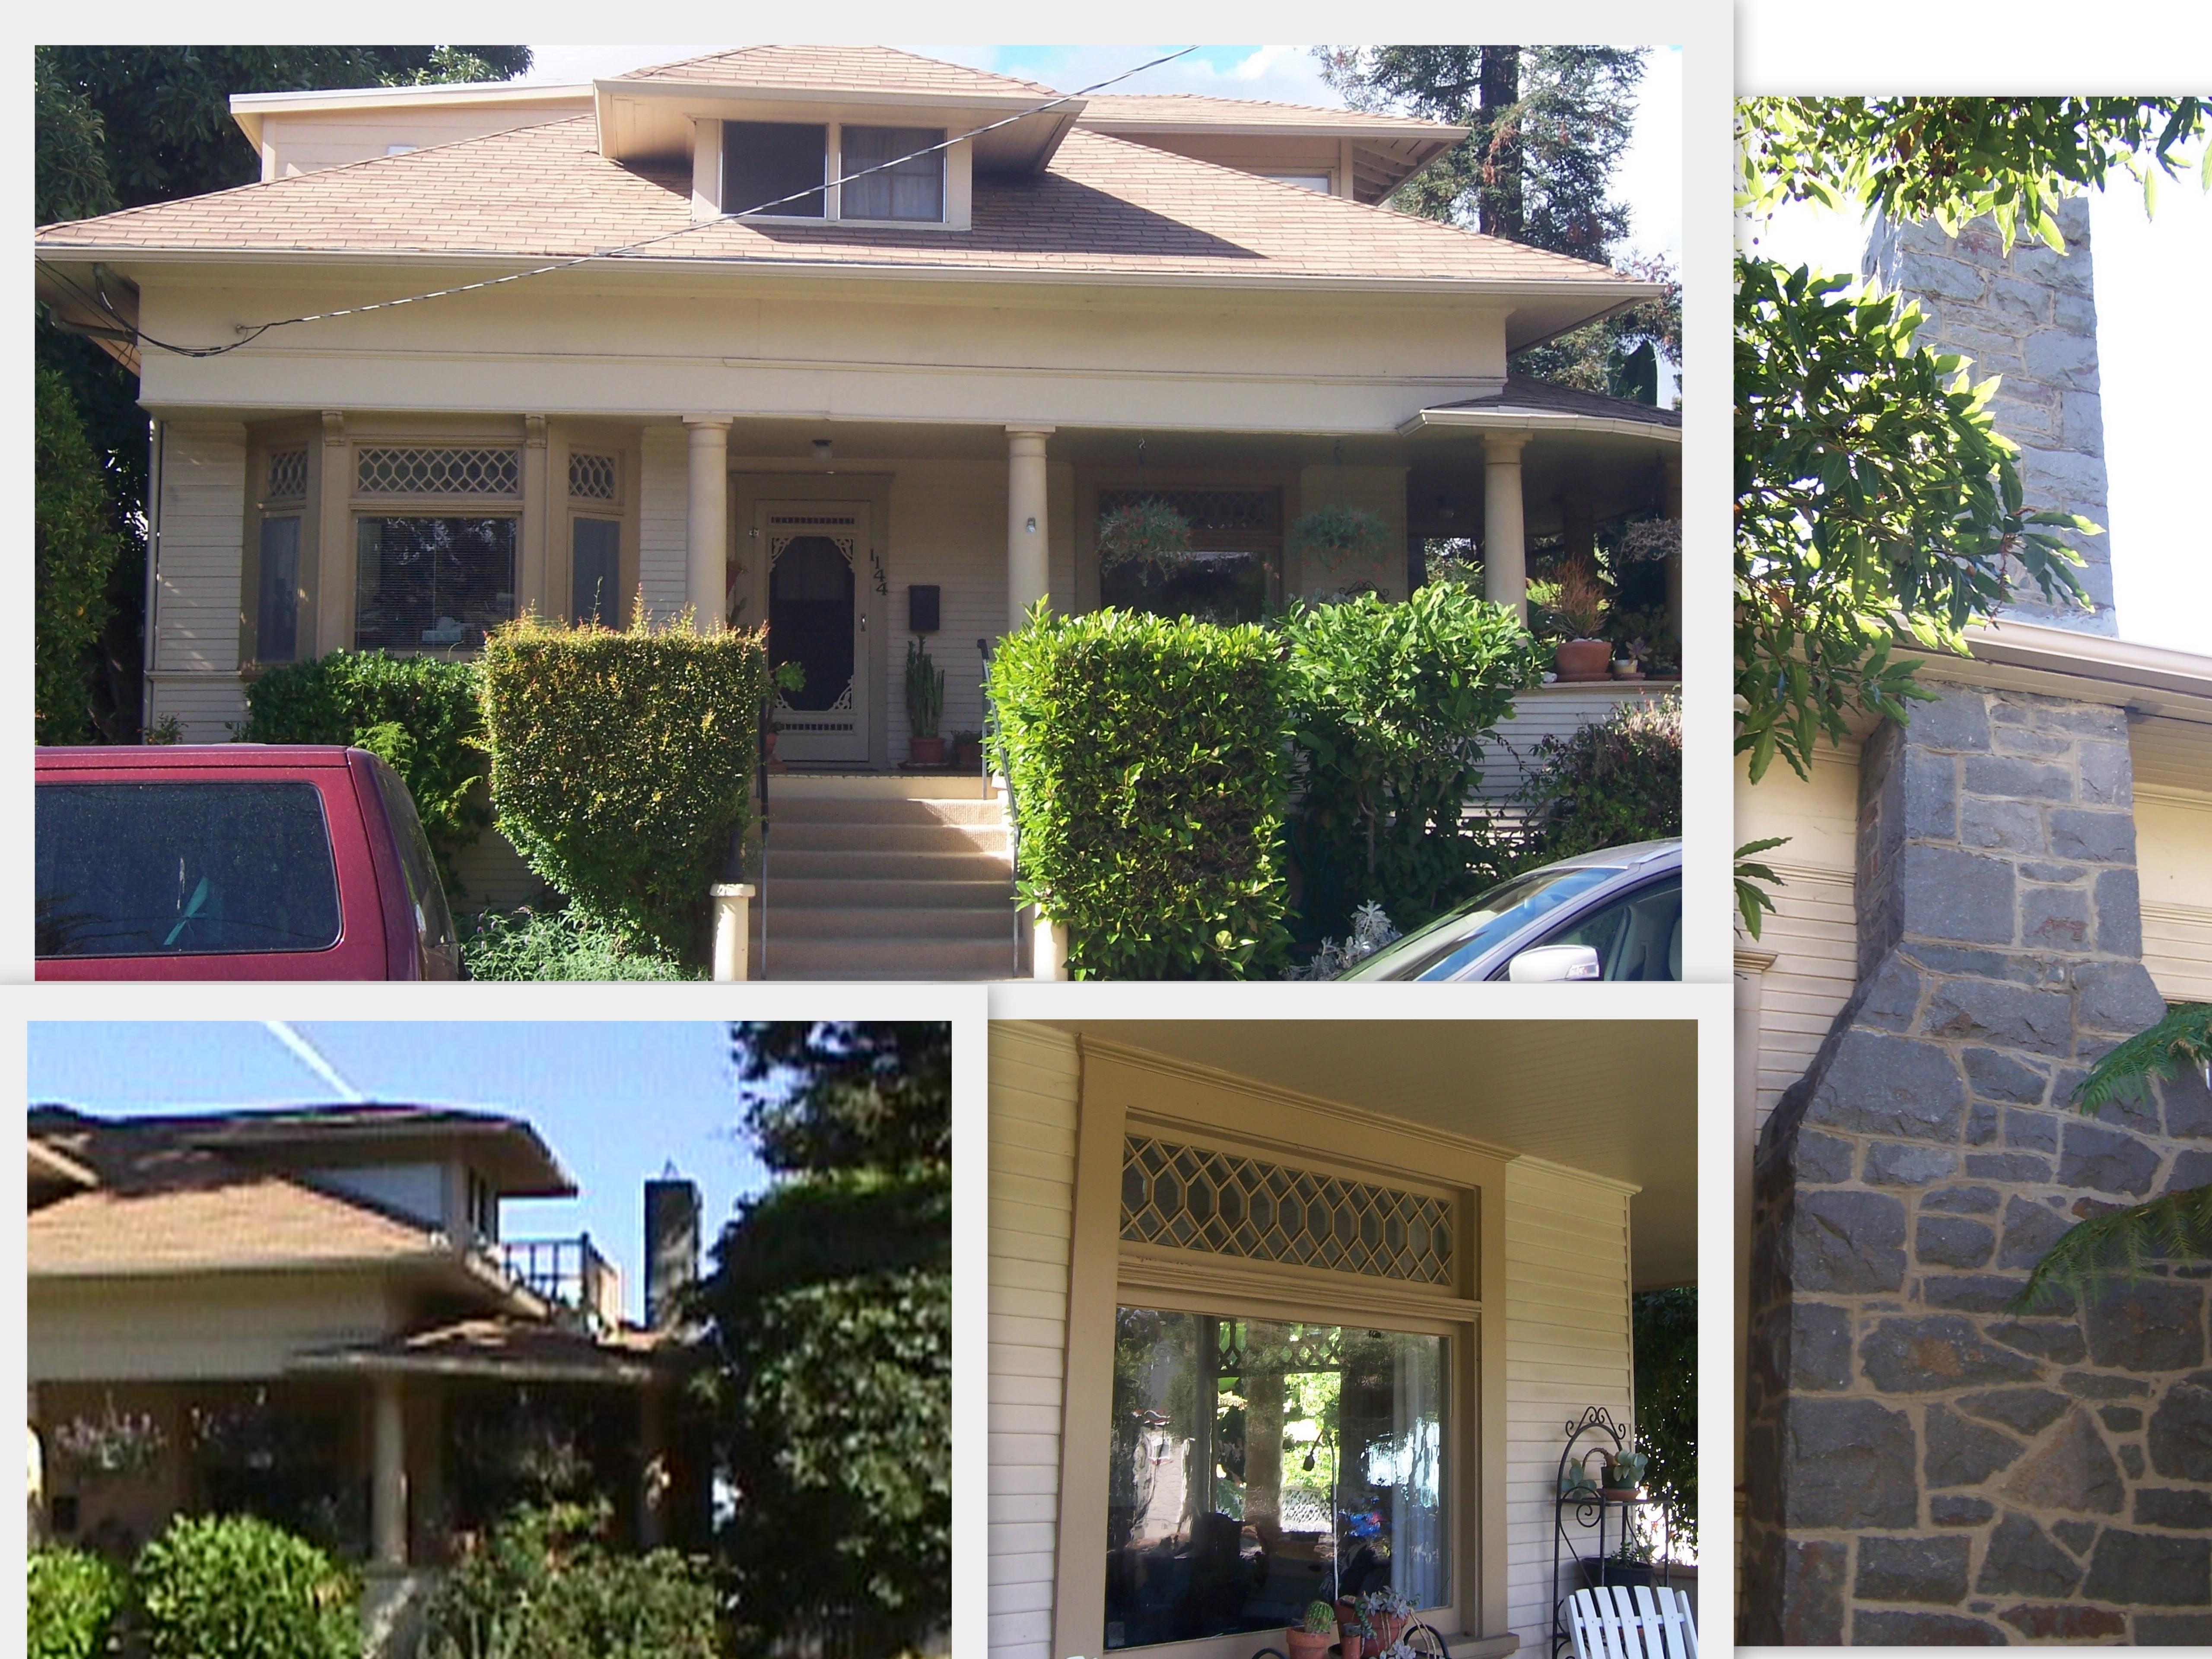 1144 Buchon St. San Luis Obispo, CA 93401